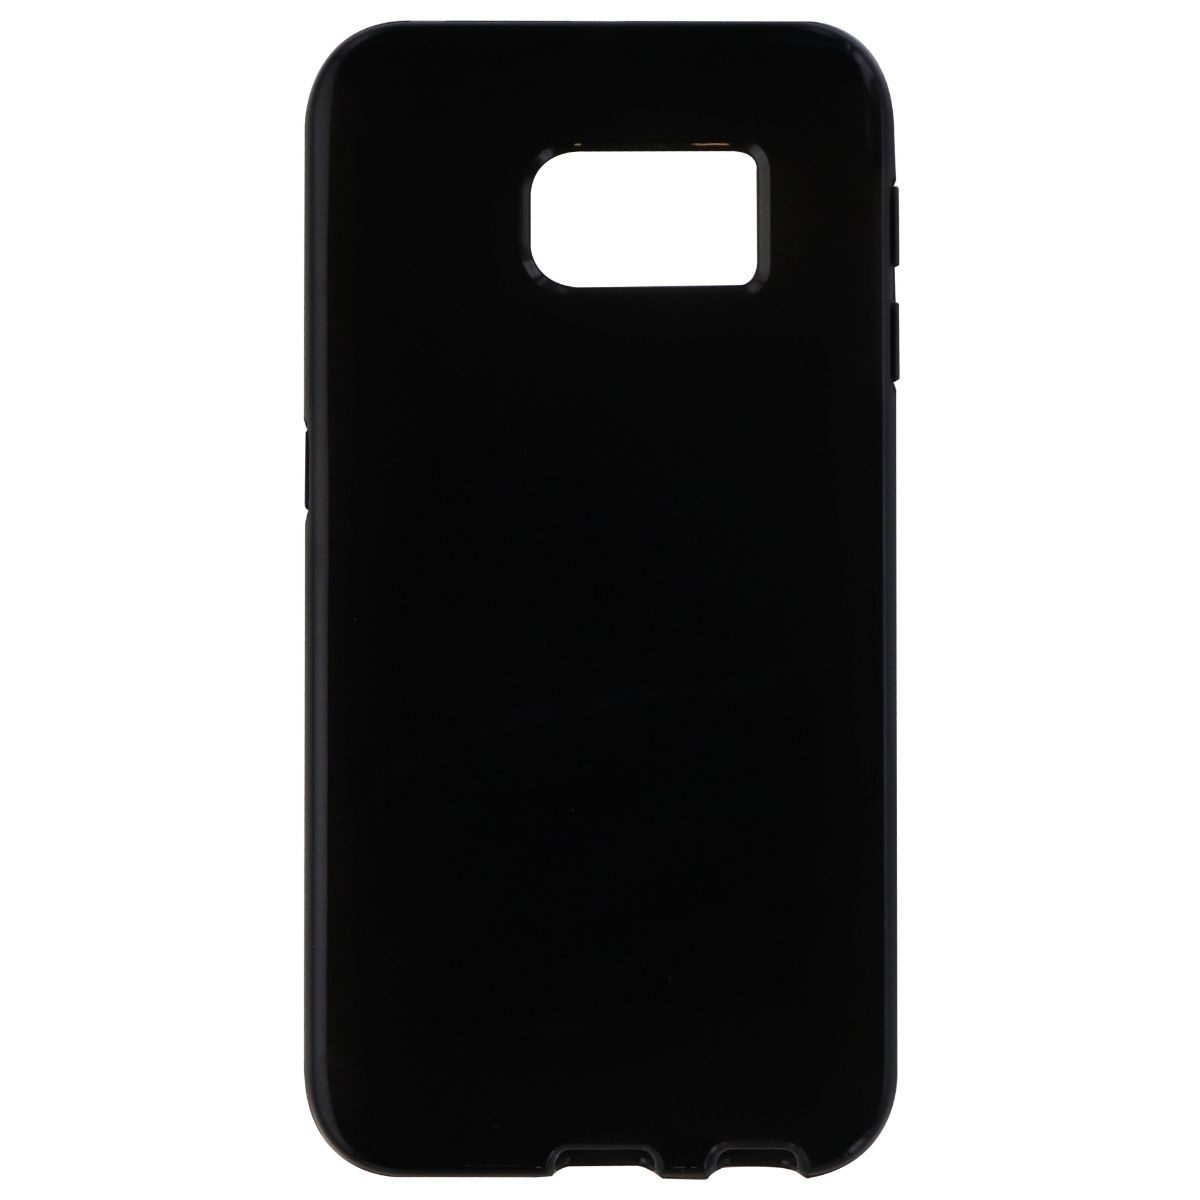 Verizon High Gloss Silicone Case for Samsung Galaxy S6 Edge - Black